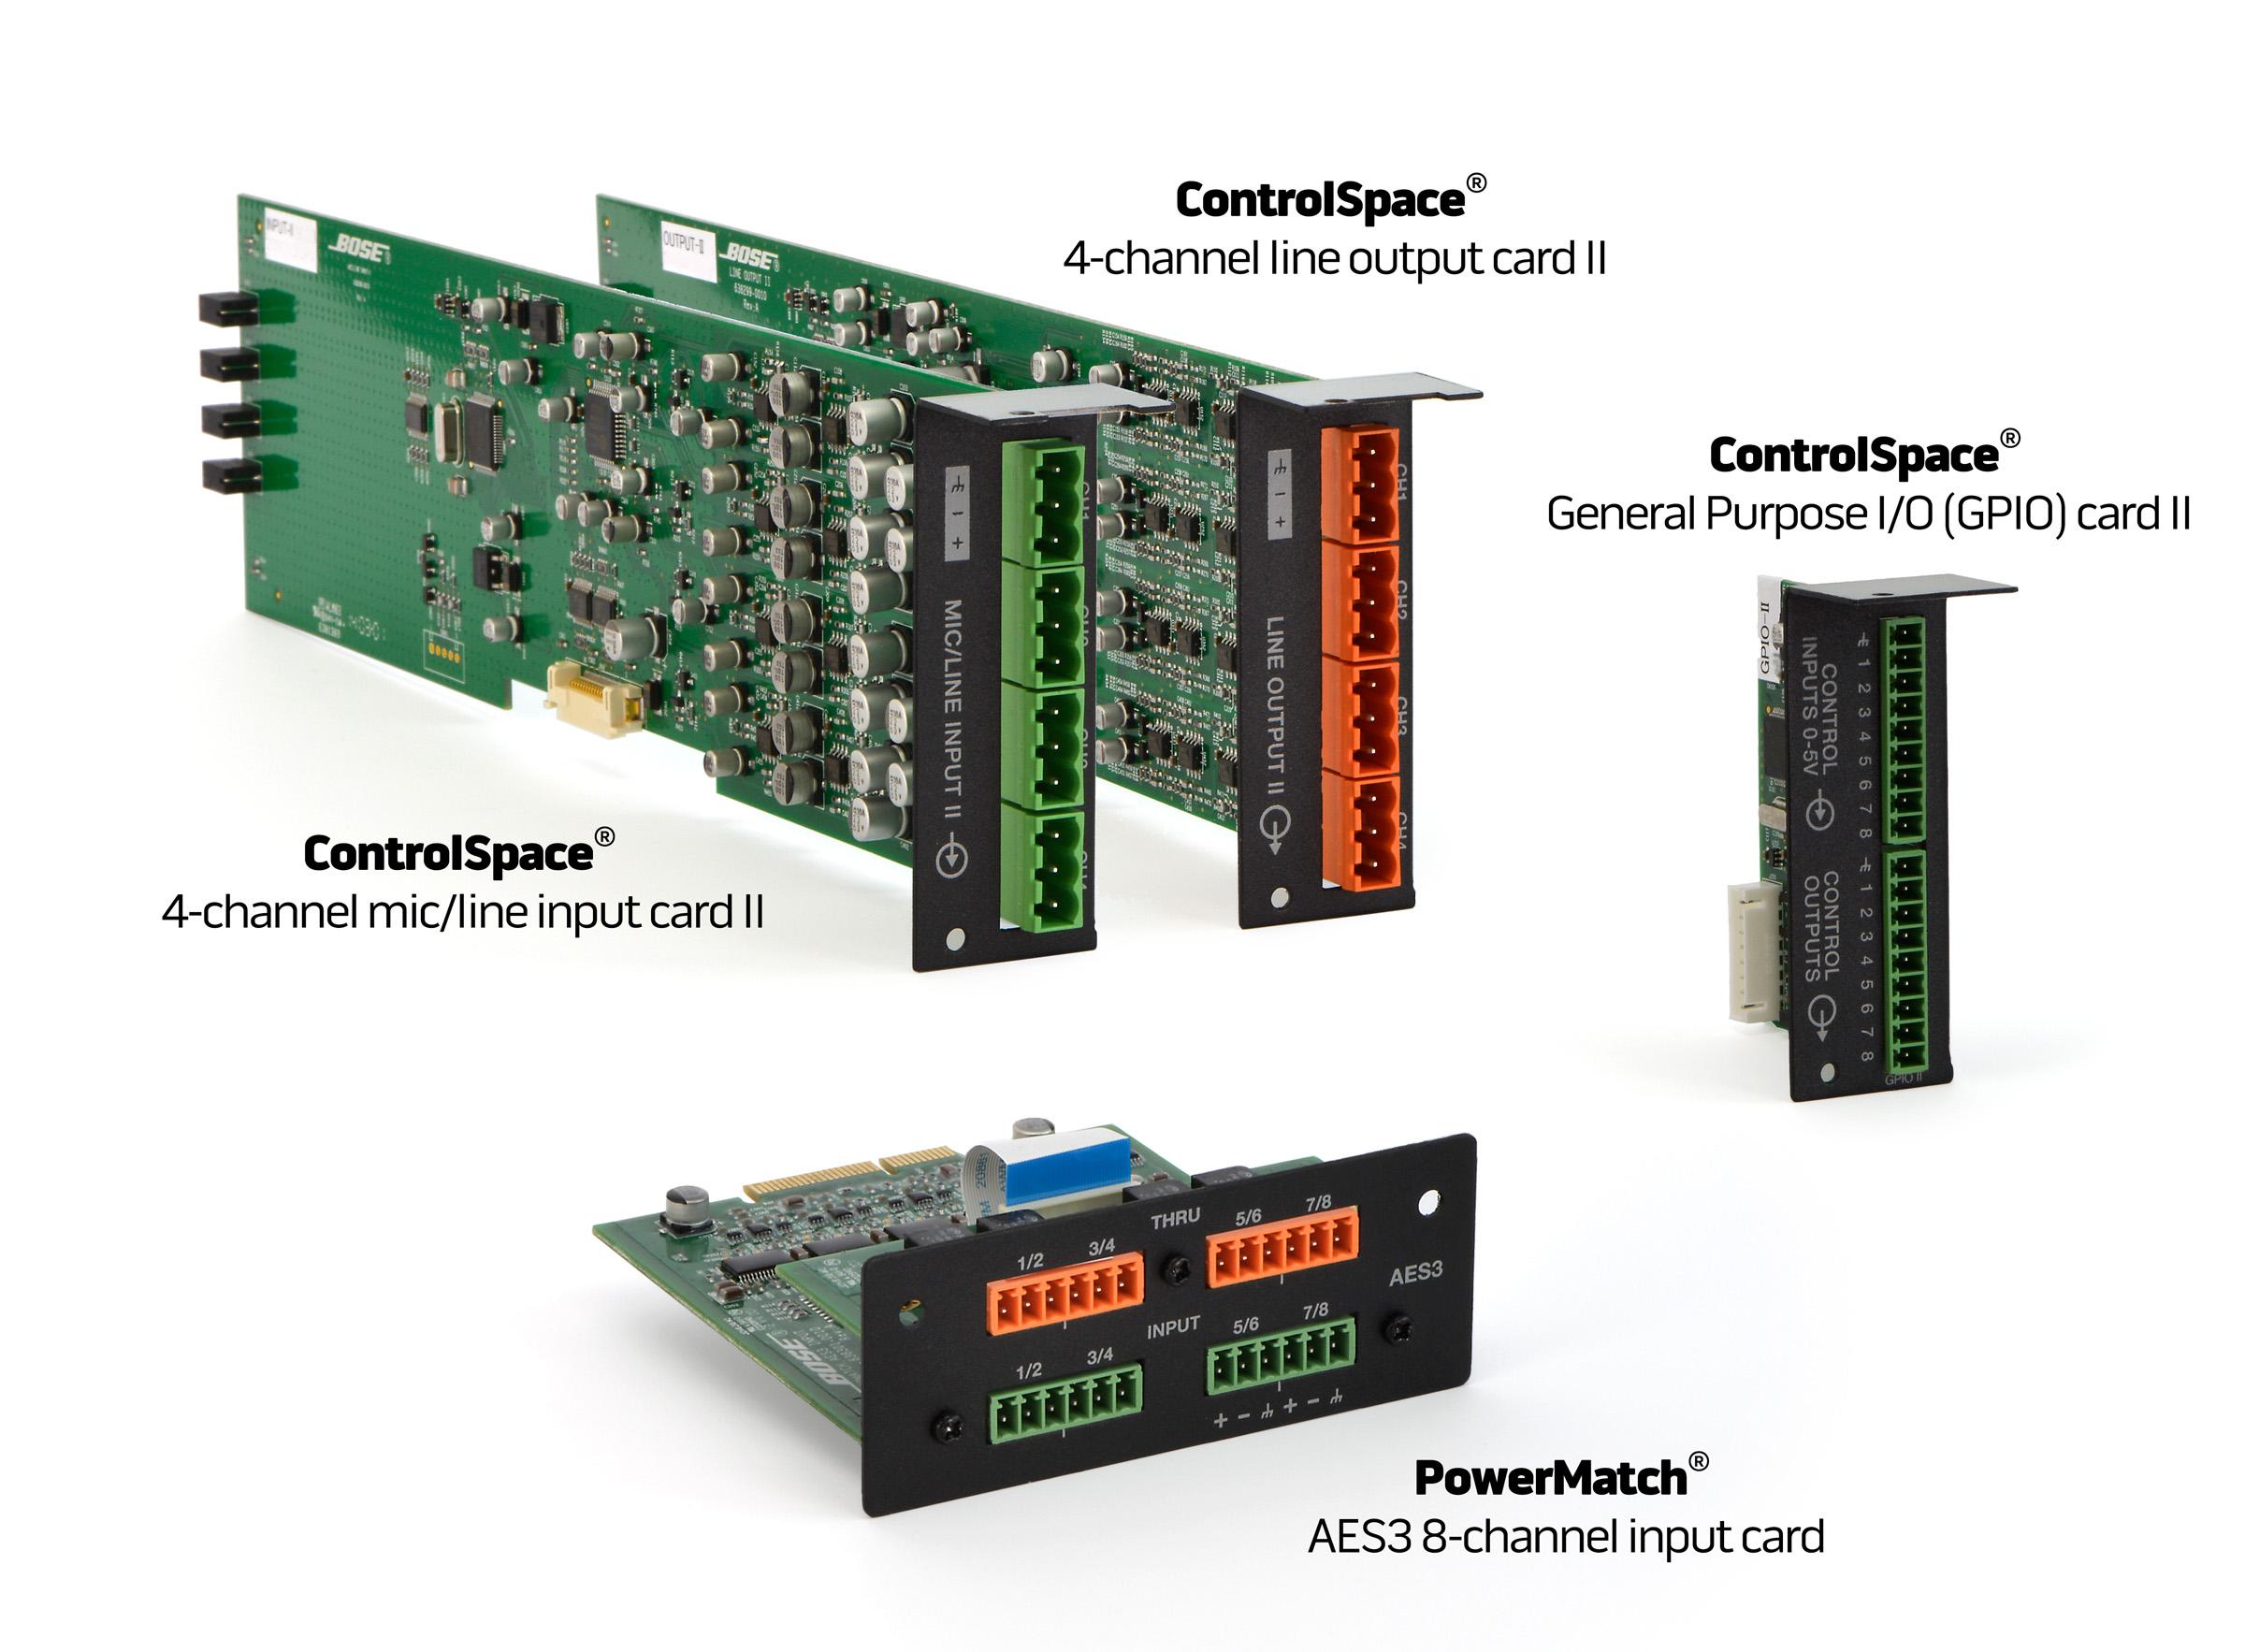 http://www.clynemedia.com/bose/ControlSpace_ESP00/ESP00_II_newcards.jpg